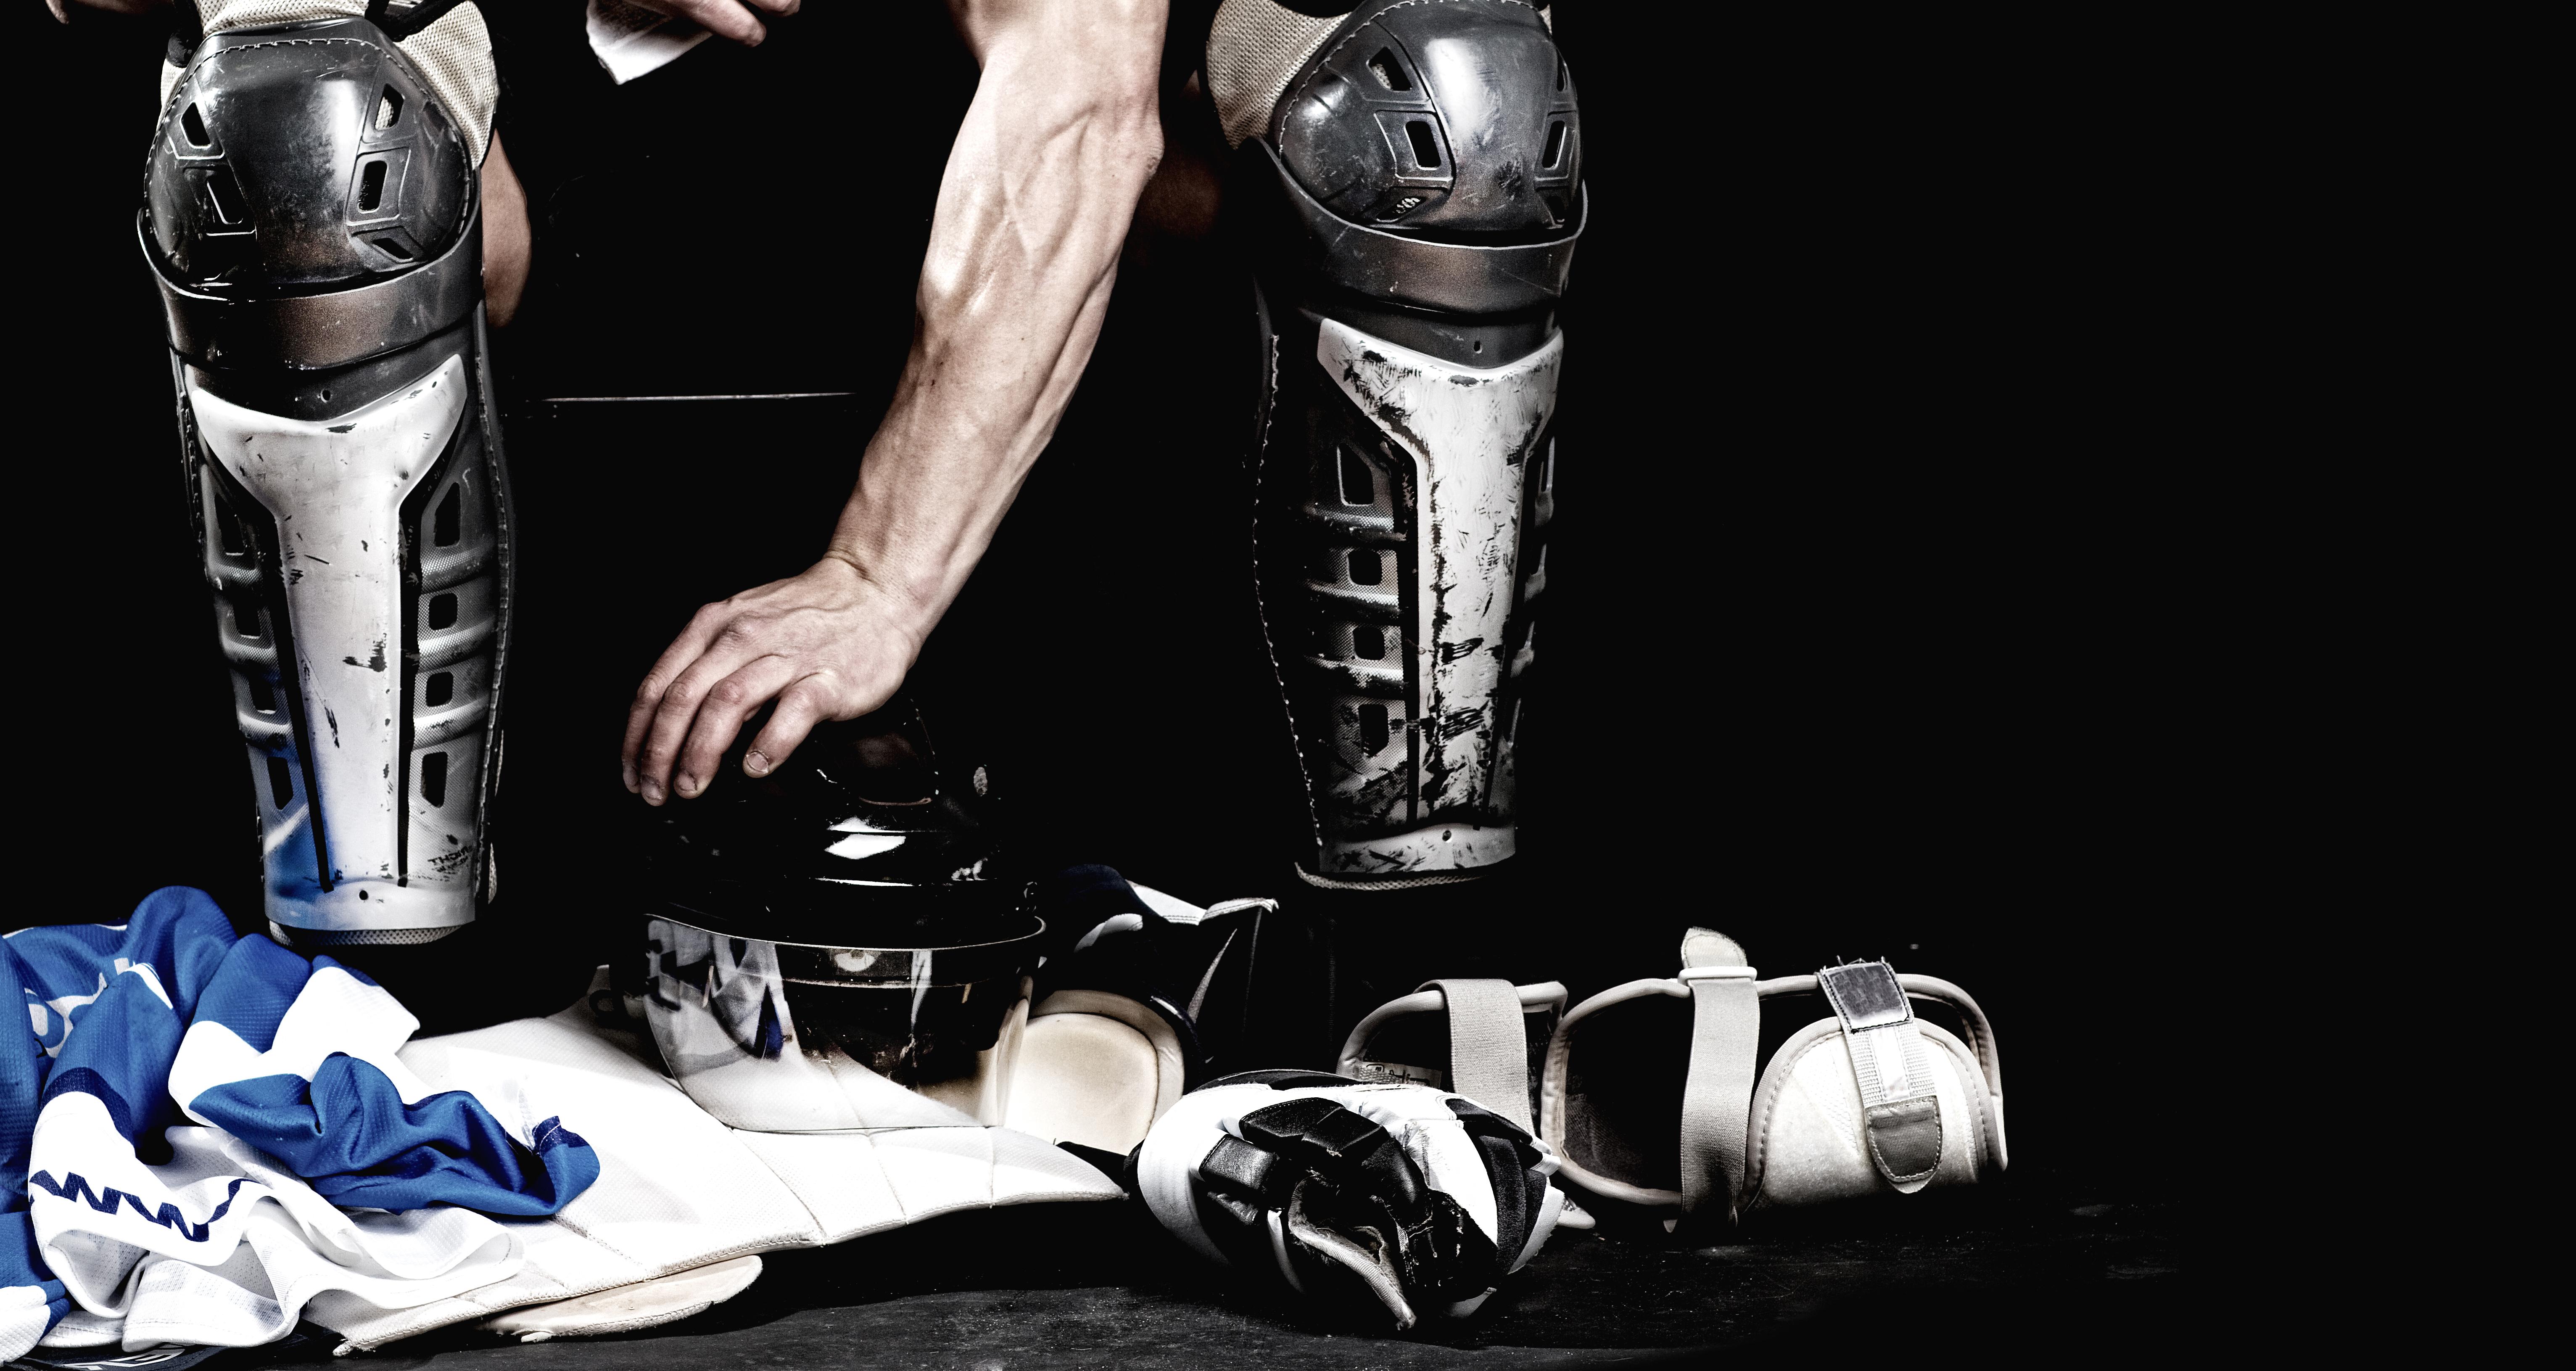 hockey player removing equipment